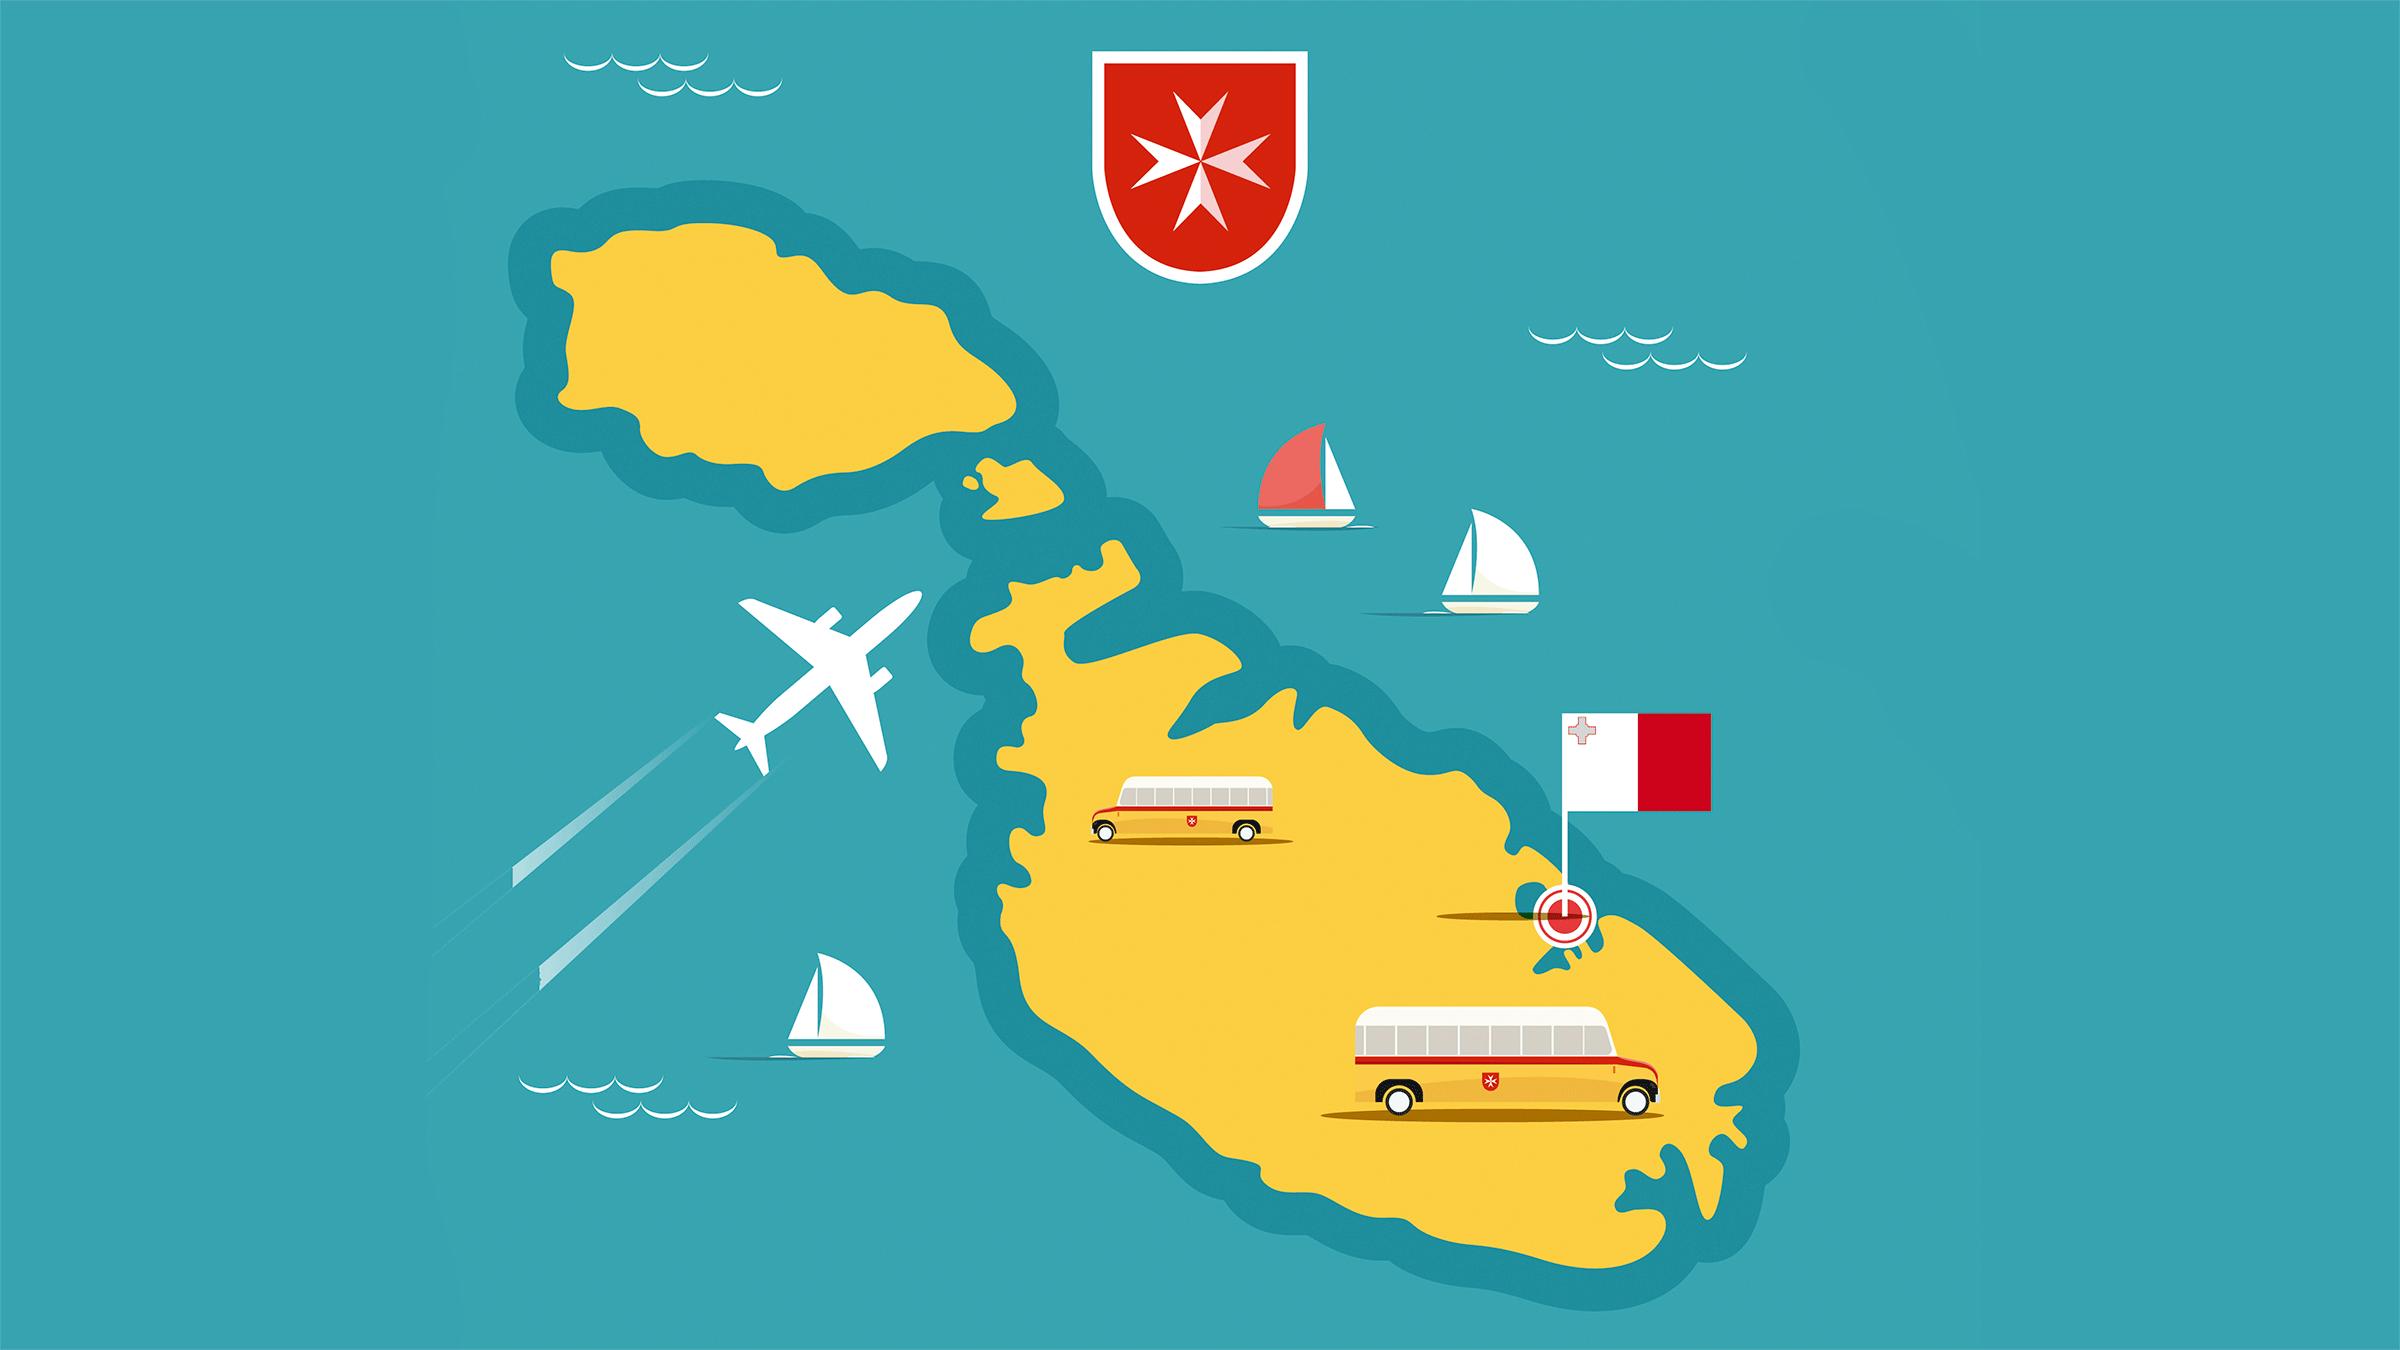 Mapa con atracciones turisticas de Malta